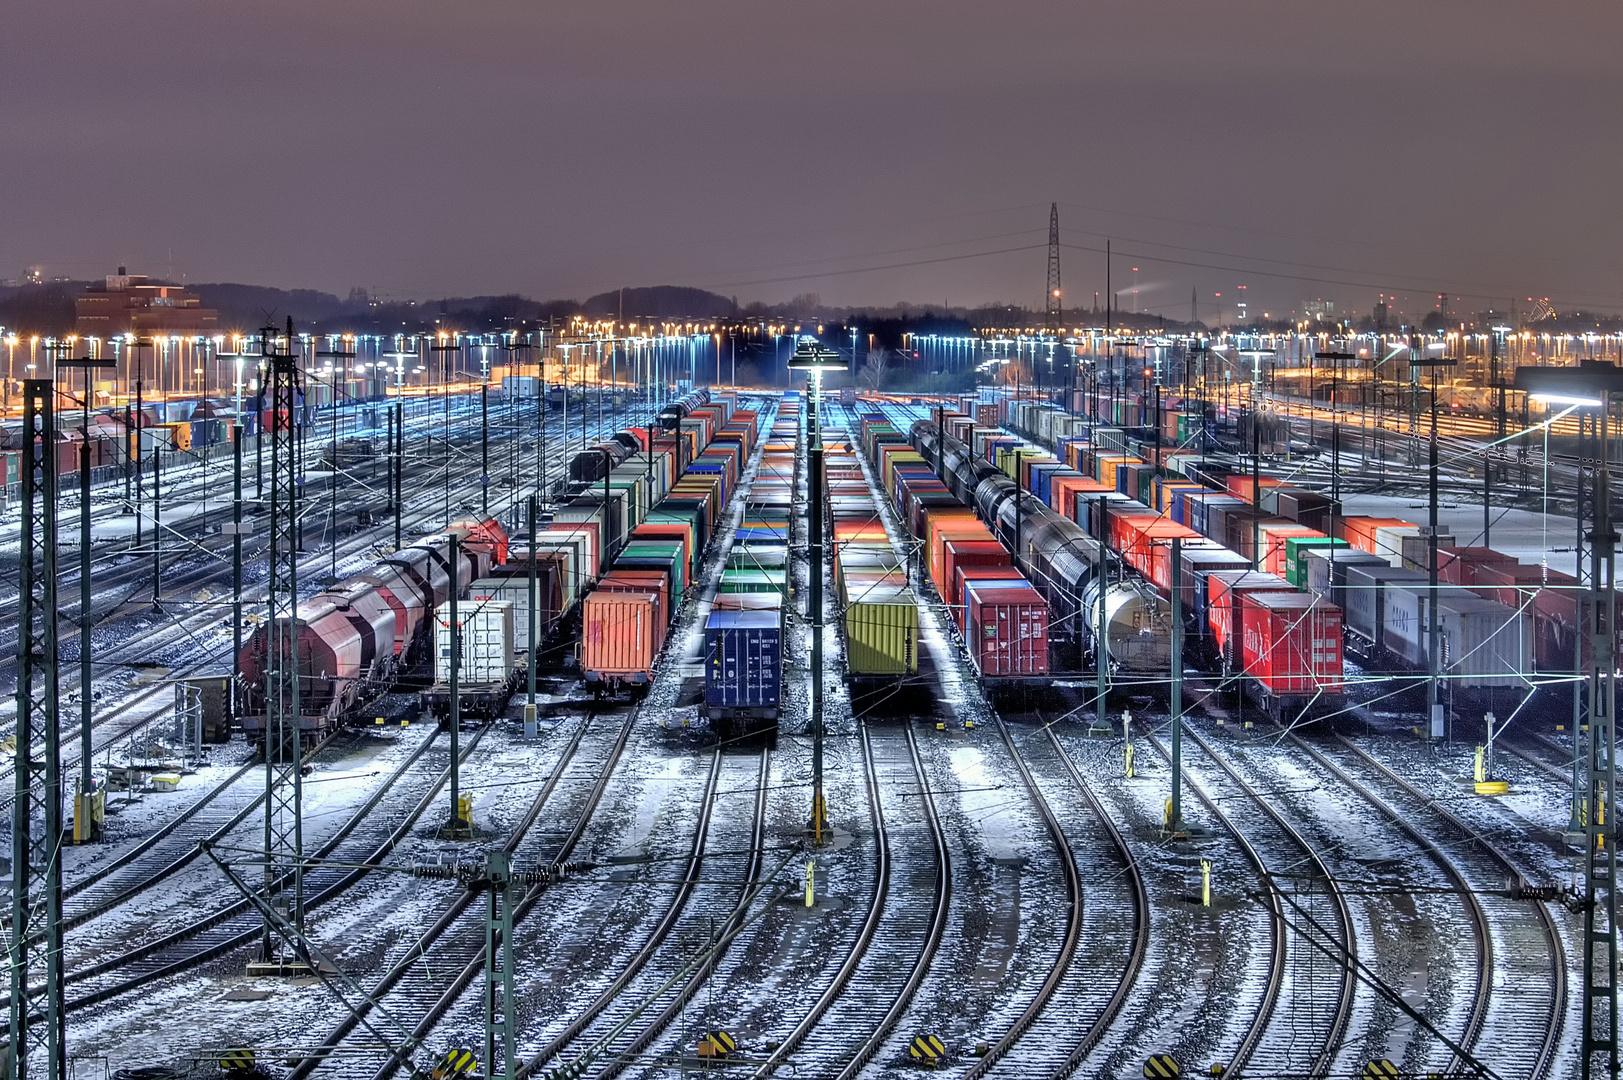 Rangierbahnhof im Winter